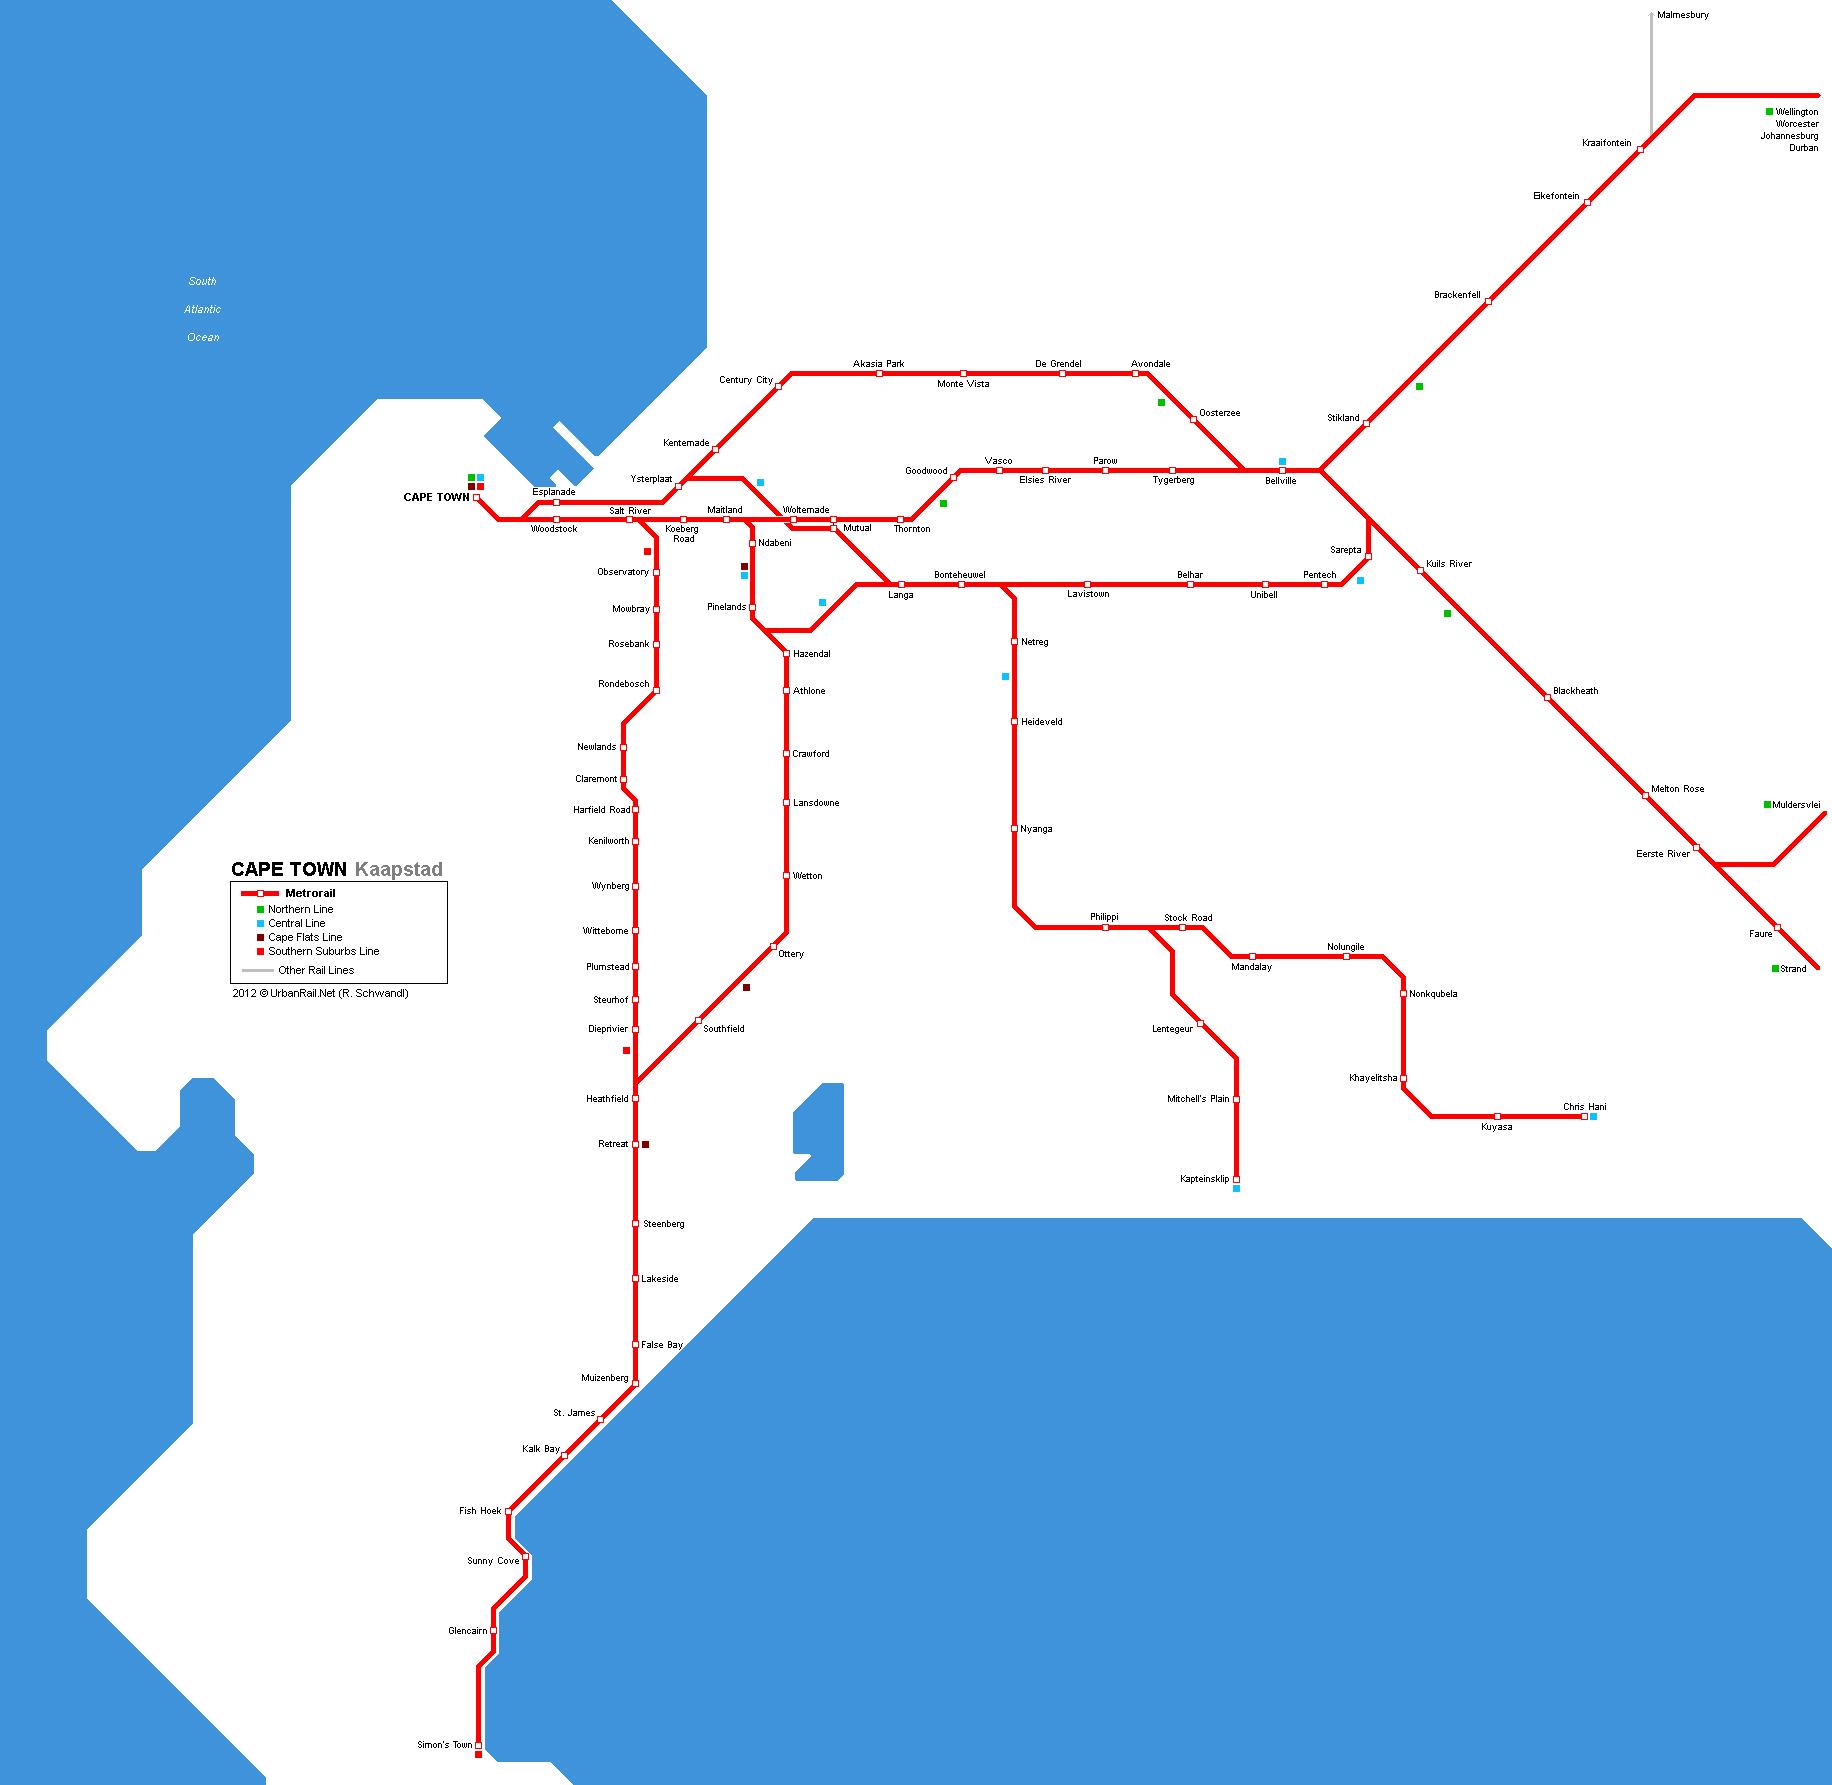 UrbanRailNet Africa South Africa Cape Town Metrorail